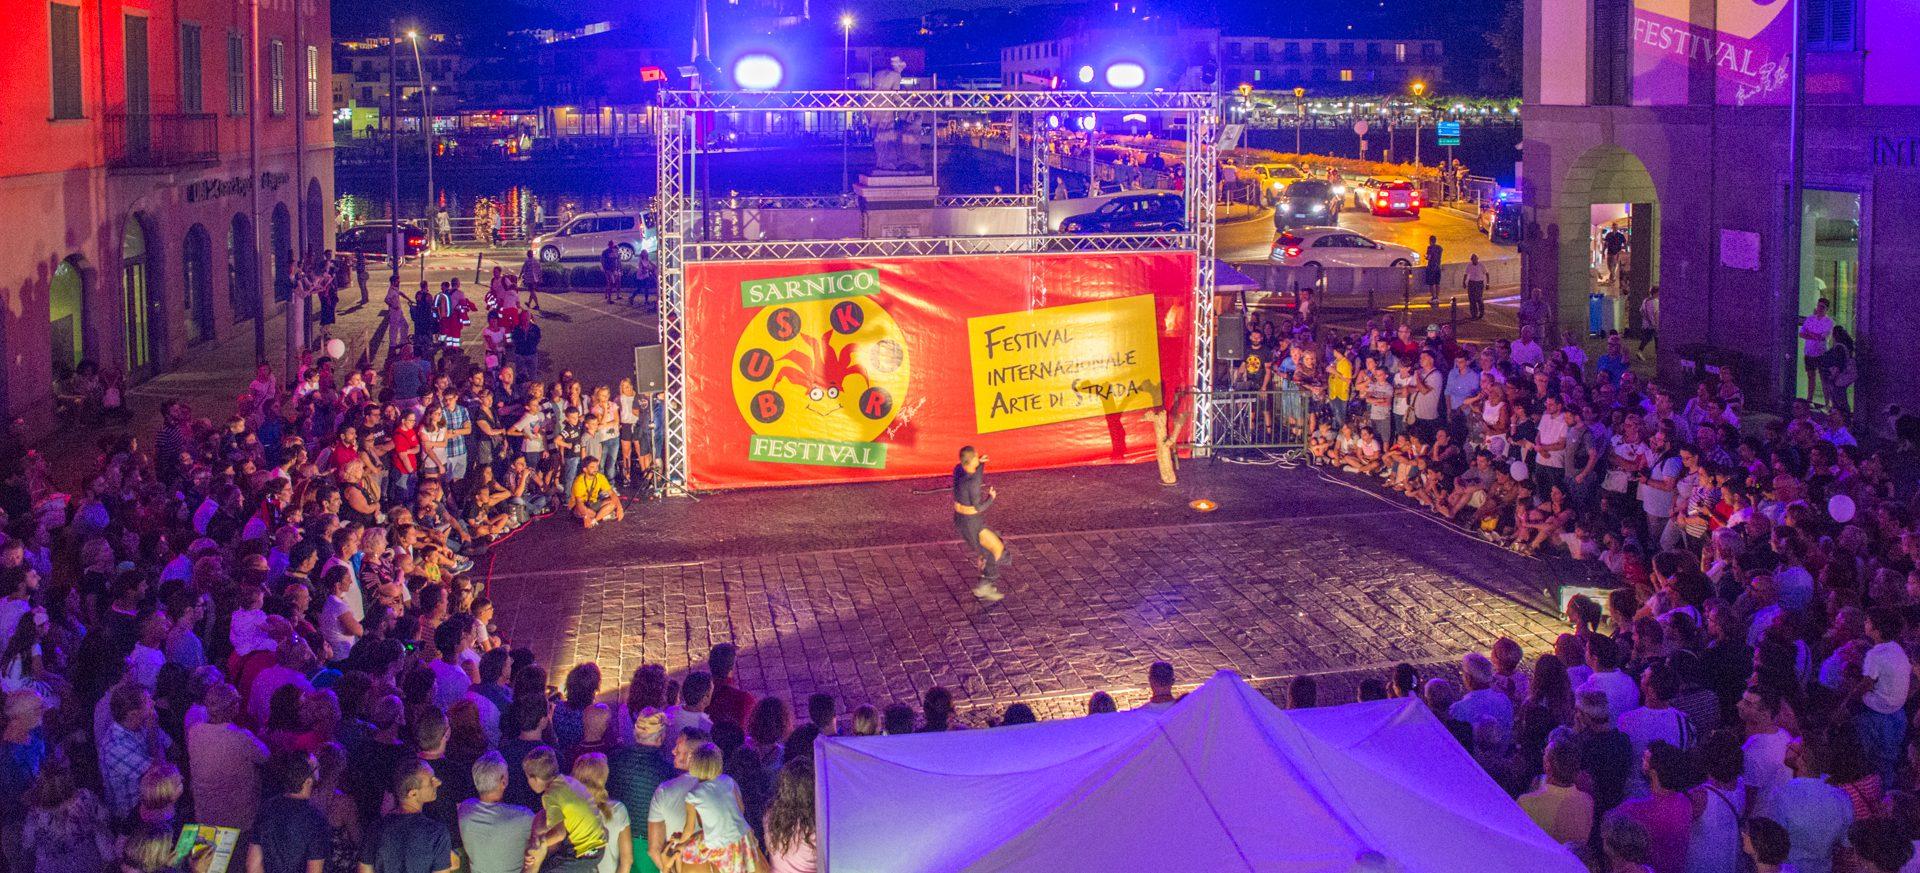 Sarnico Busker Festival 2017 1